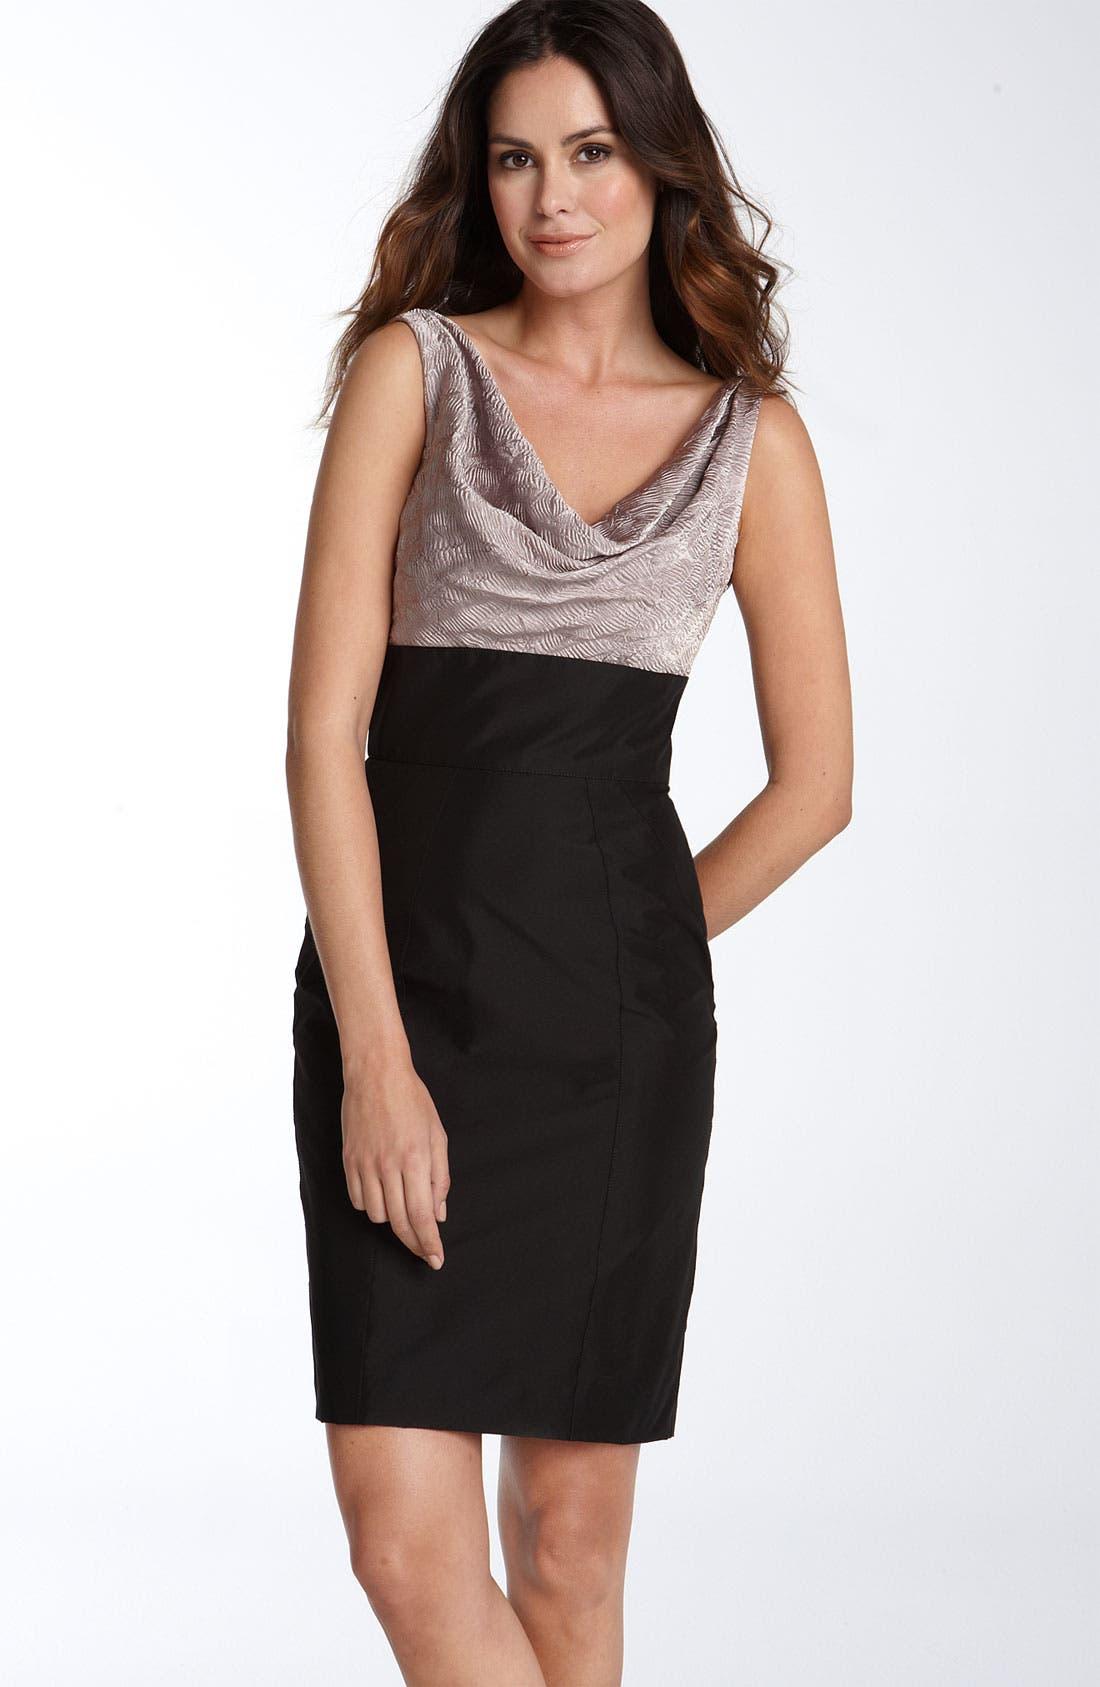 MAGGY LONDON Charmeuse Bodice Sheath Dress, Main, color, 001